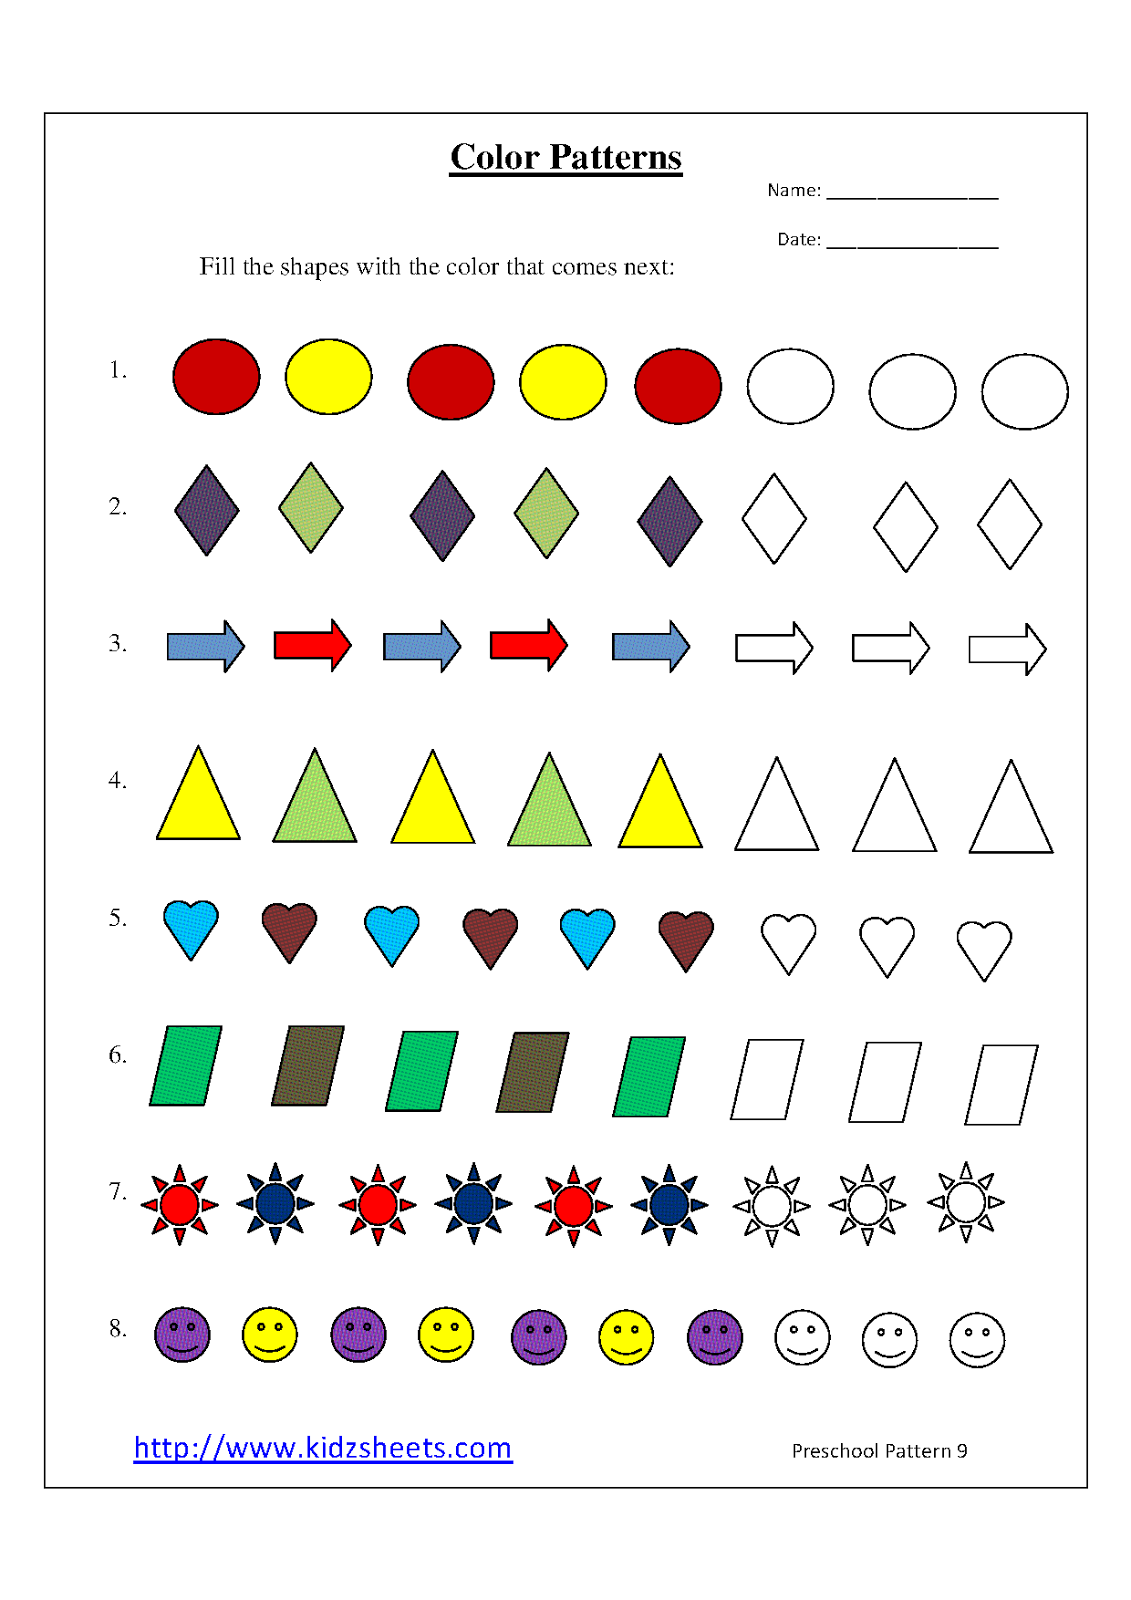 hight resolution of Kidz Worksheets: Preschool Color Patterns Worksheet9